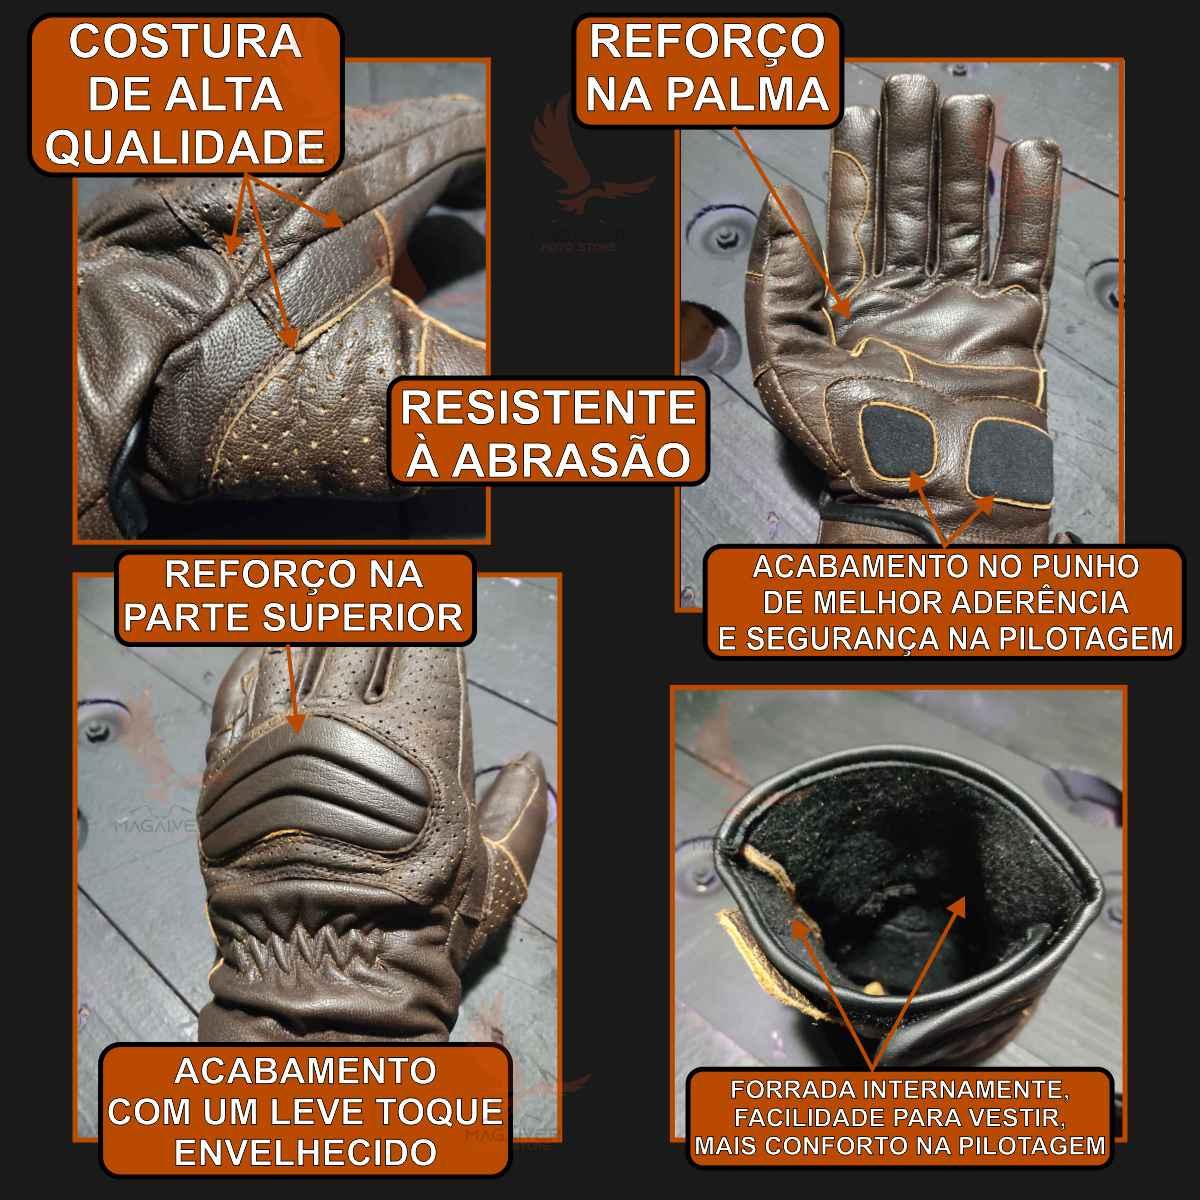 KIT CAPACETE ABERTO KRAFT CUSTOM PLUS VINTAGE REVESTIDO + LUVA DE COURO BOVINO HLX MARROM RETRÔ